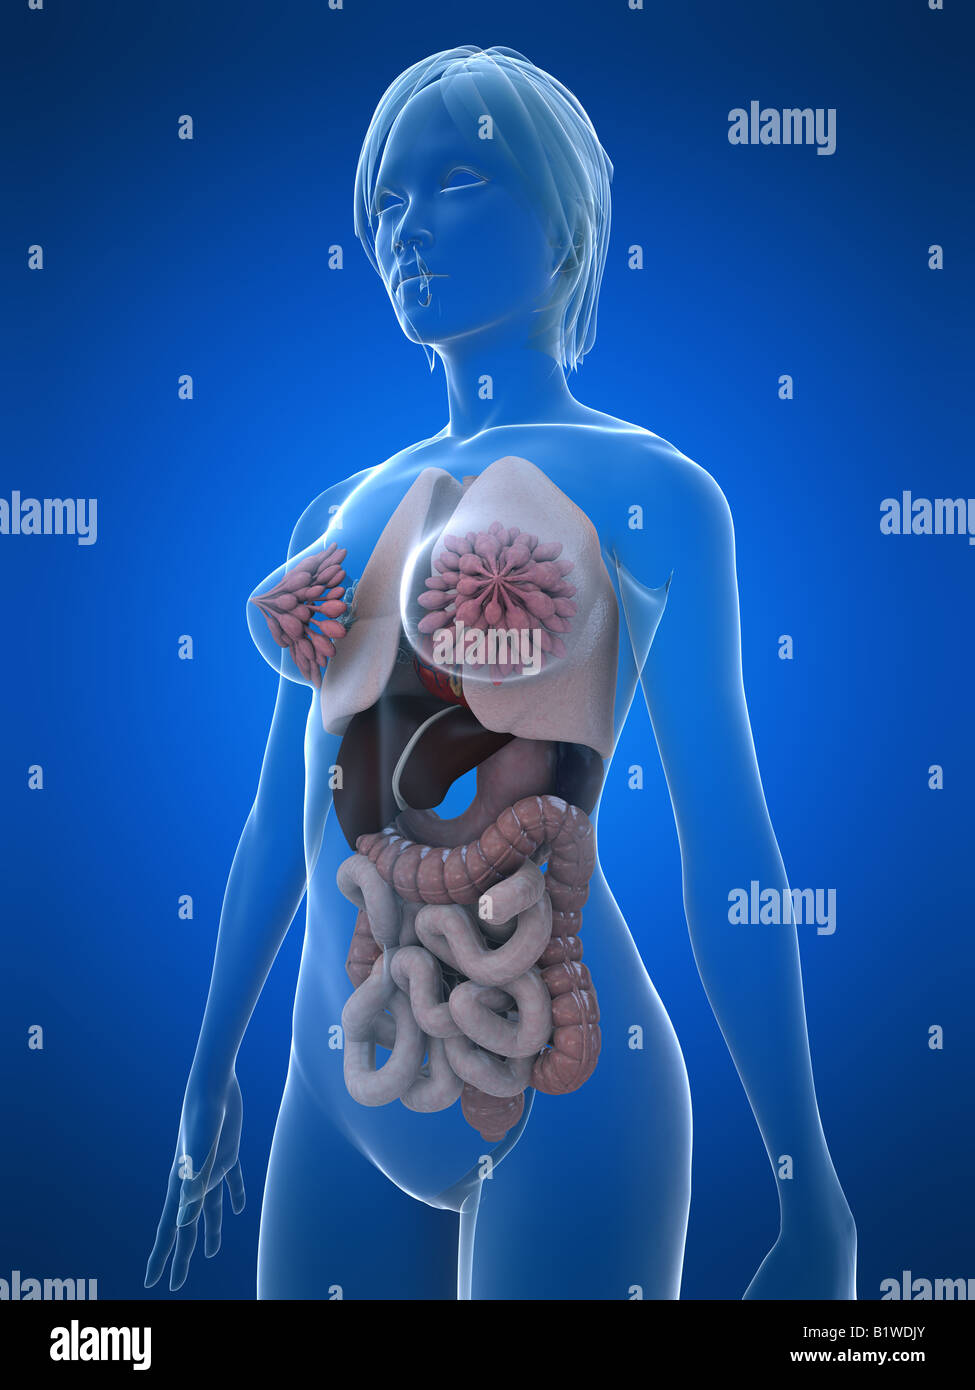 Female Organs Stockfotos & Female Organs Bilder - Alamy